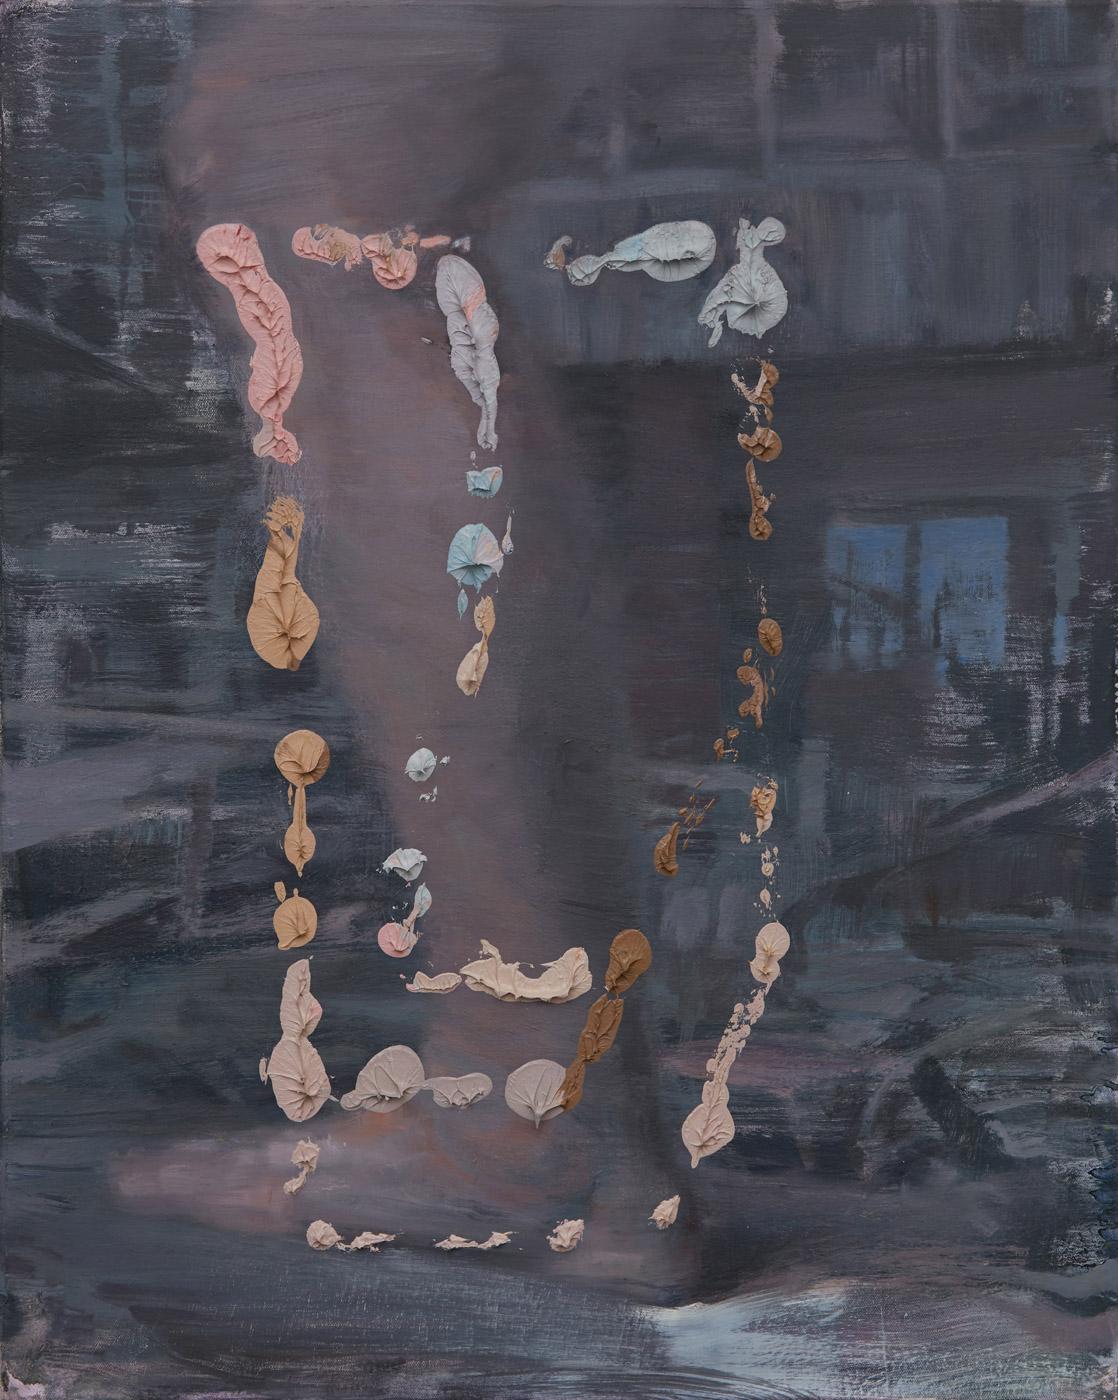 The Last Y (interior), 2020, Oil on canvas, 76 x 61 cm